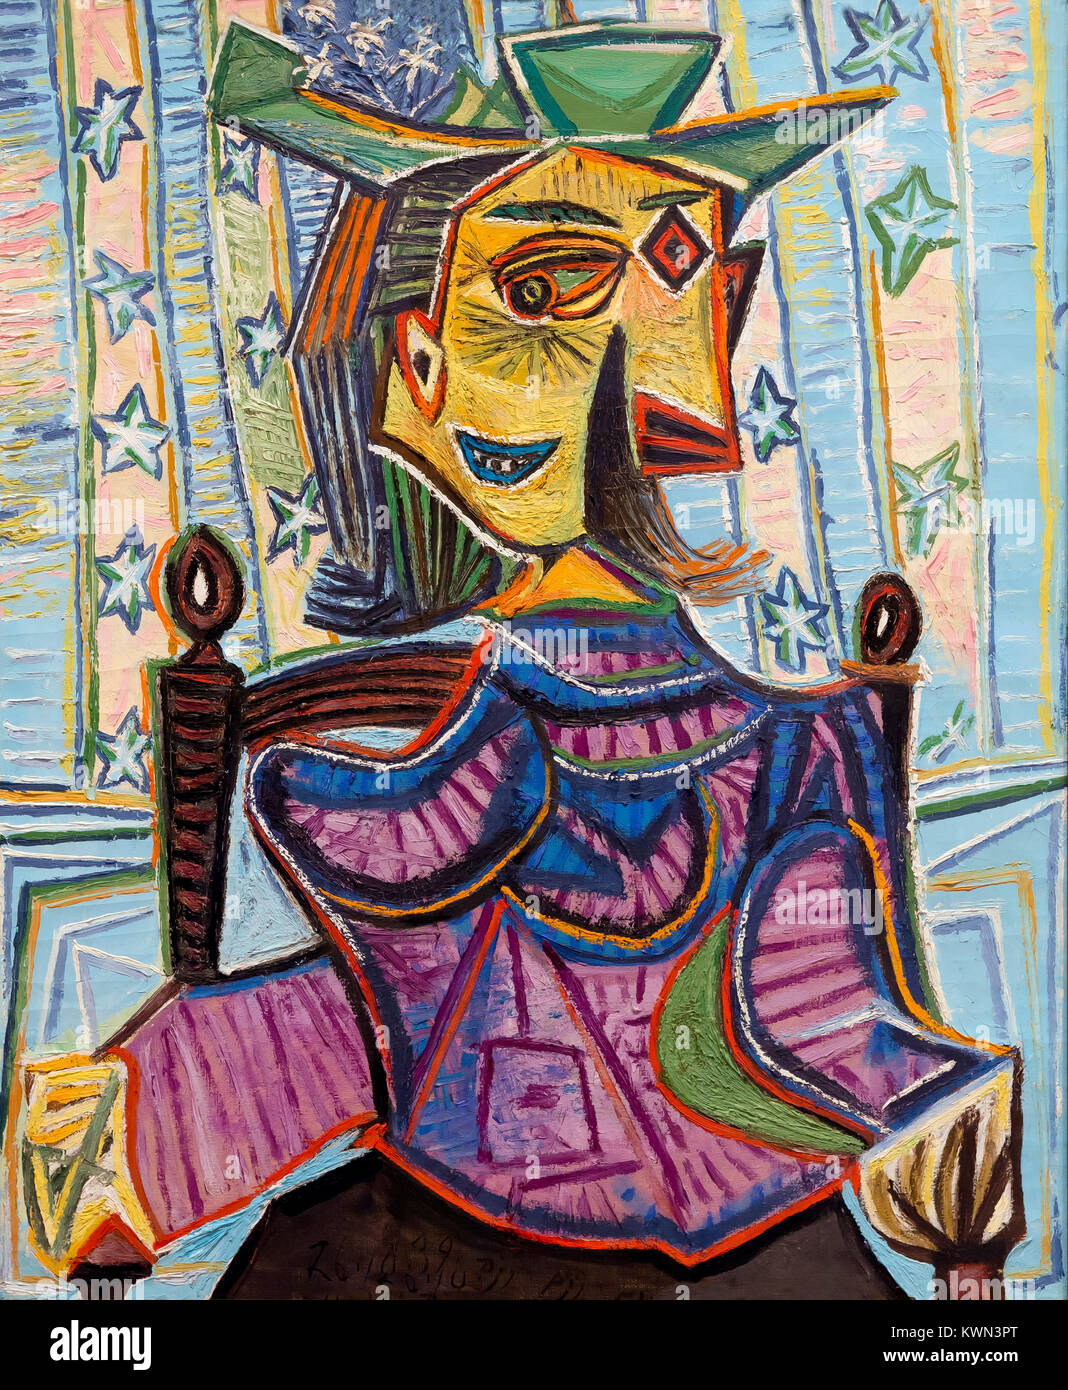 Dora Maar in an Armchair, Pablo Picasso, 1939, - Stock Image